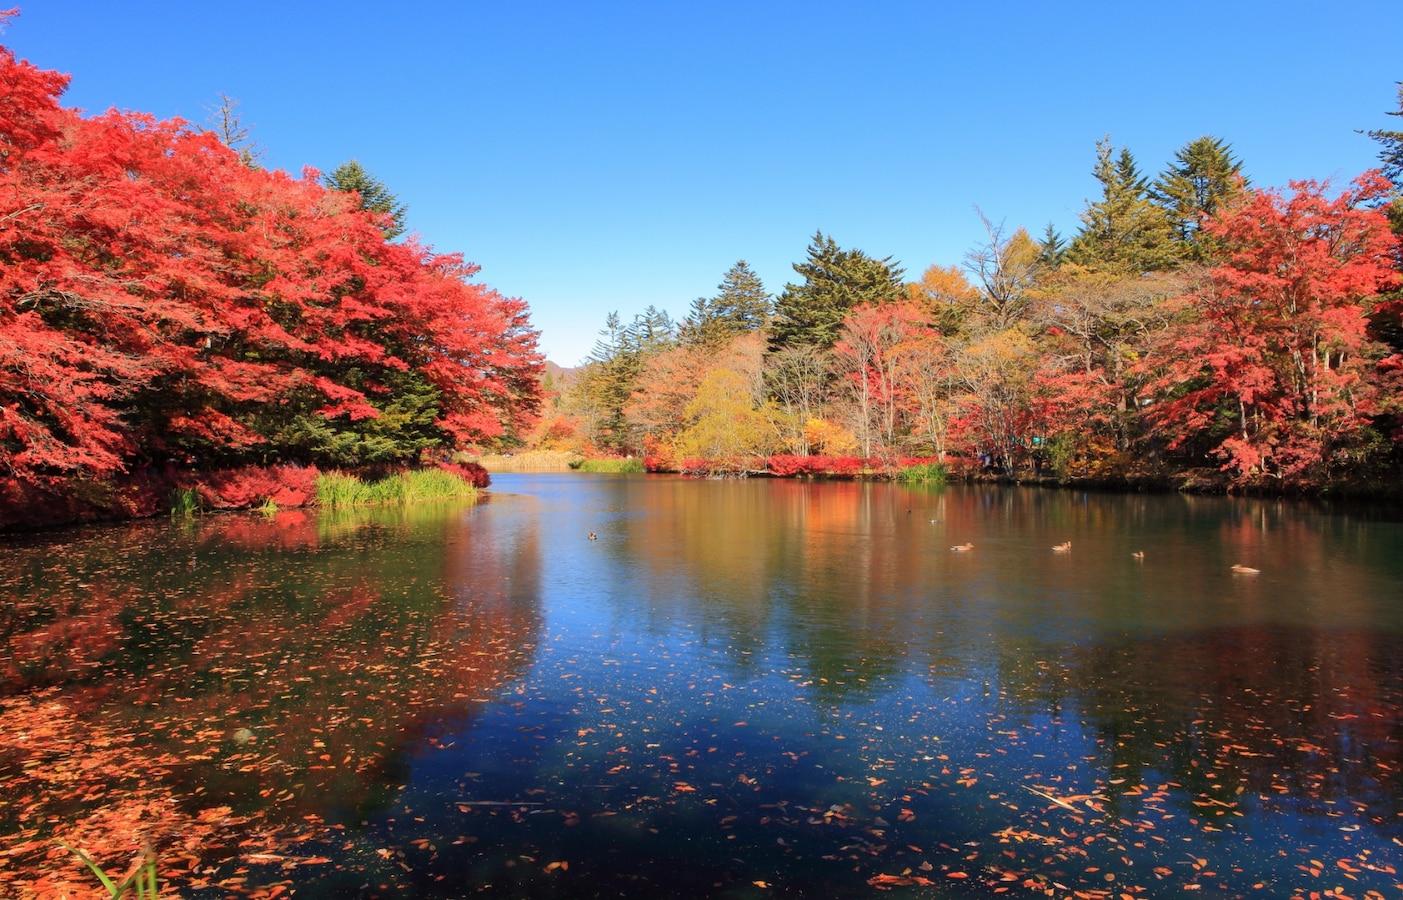 5 Outdoor Autumn Activities In Karuizawa All About Japan